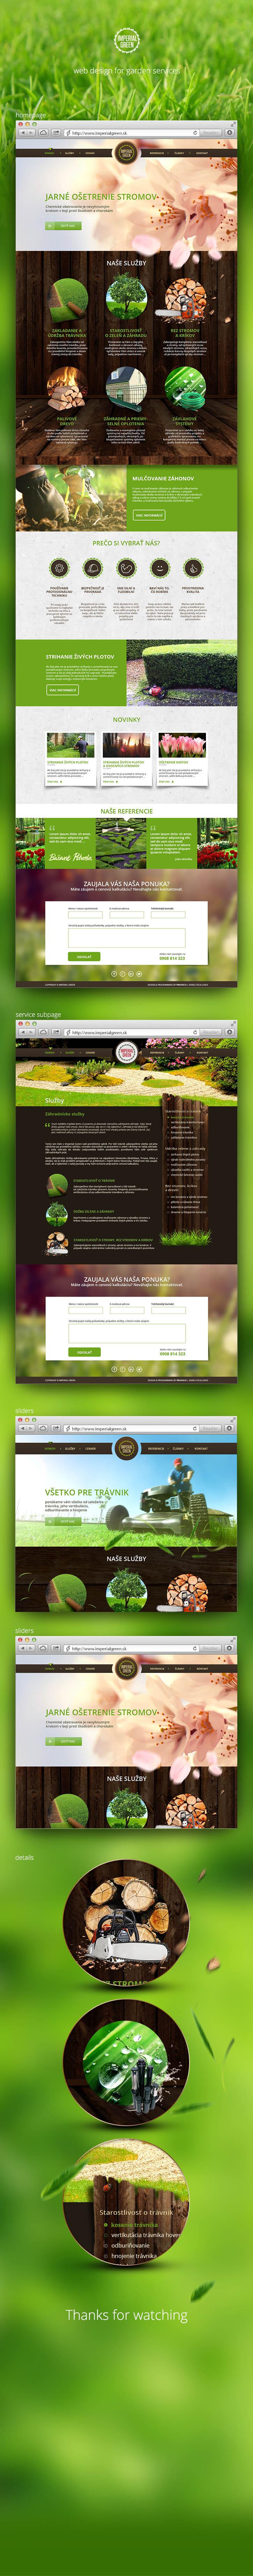 IMPERIAL GREEN - garden services website https://www.behance.net/gallery/16894805/IMPERIAL-GREEN-garden-services-website